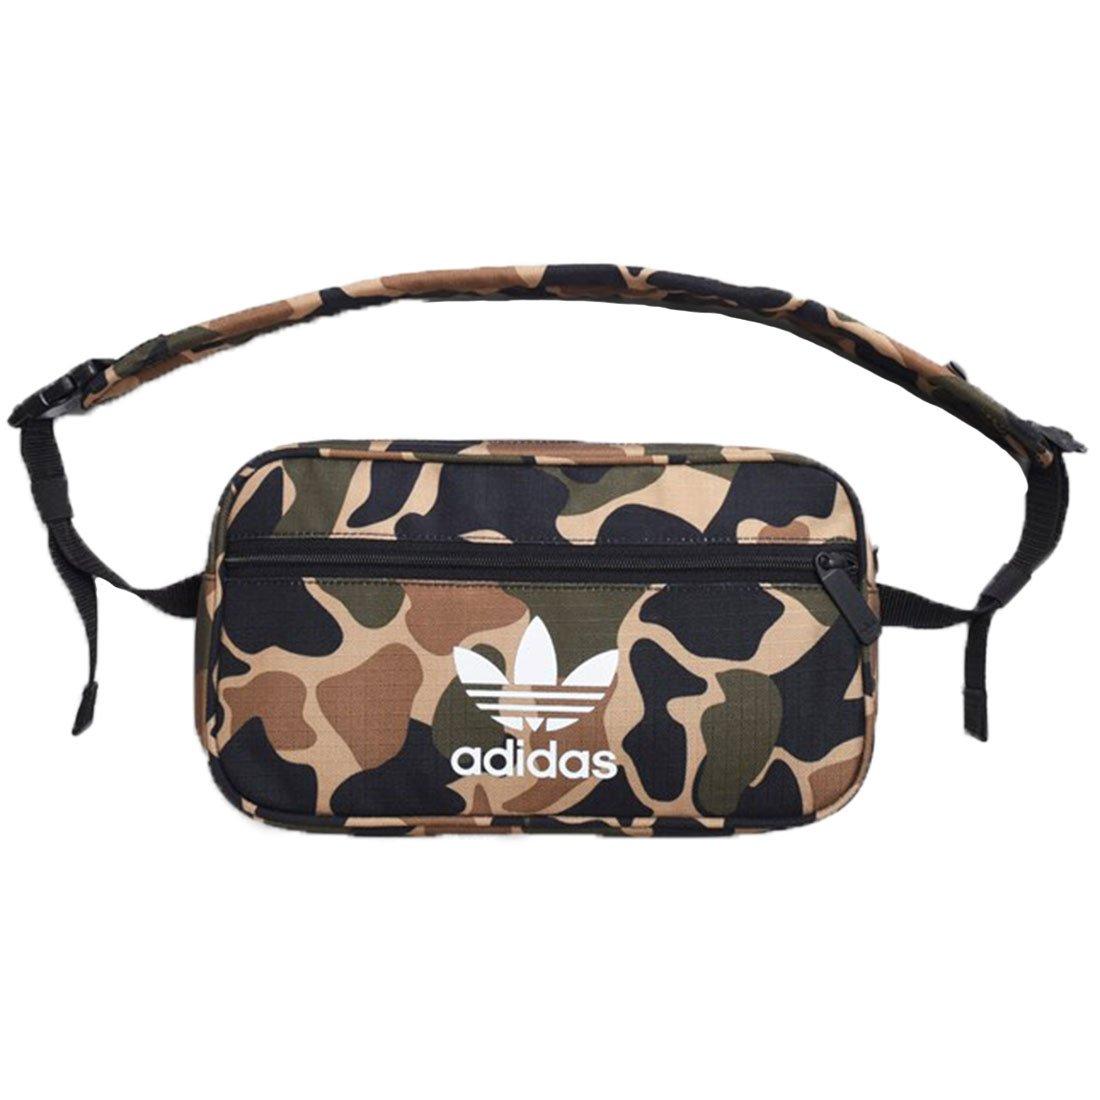 adidas Camo Print Herren Waist Bag Grü n Mehrfarbig (Multco) 17x15x25 Centimeters CD6132